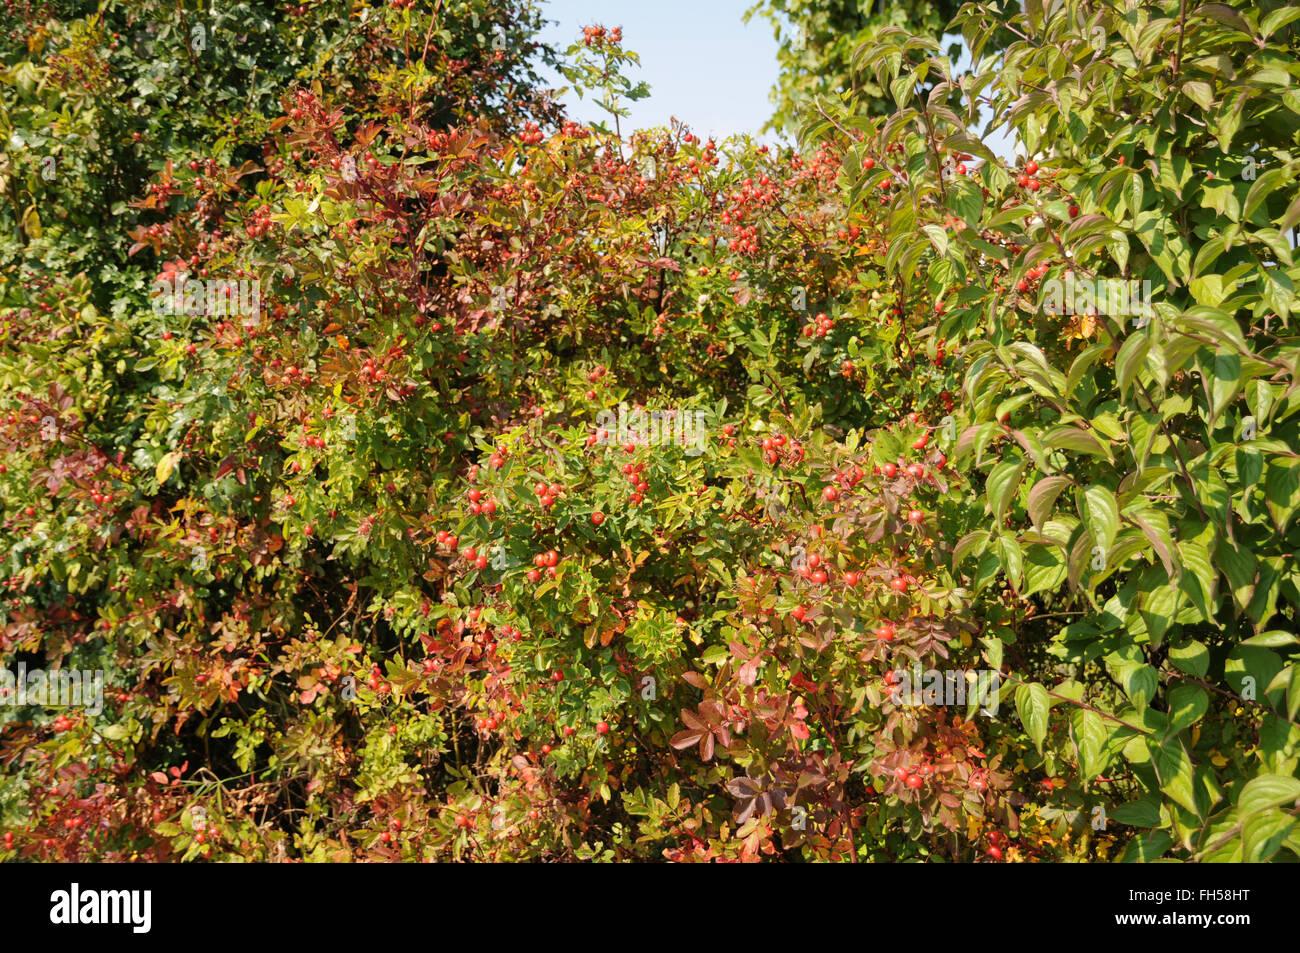 Shining rose - Stock Image